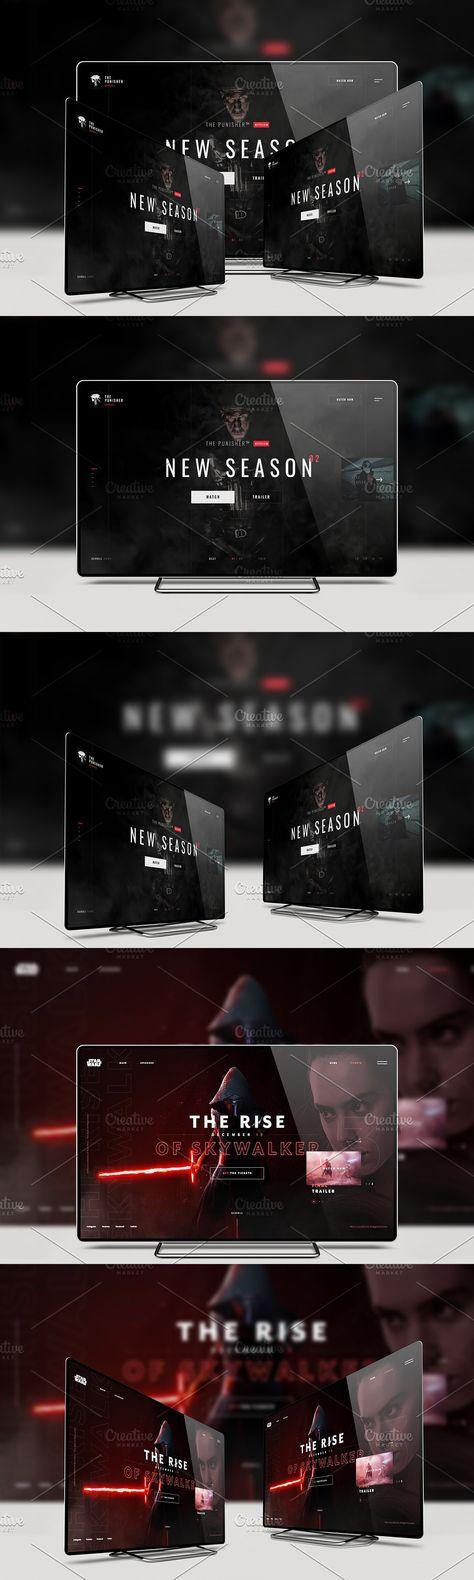 4k (Ultra HD) TV Mockup